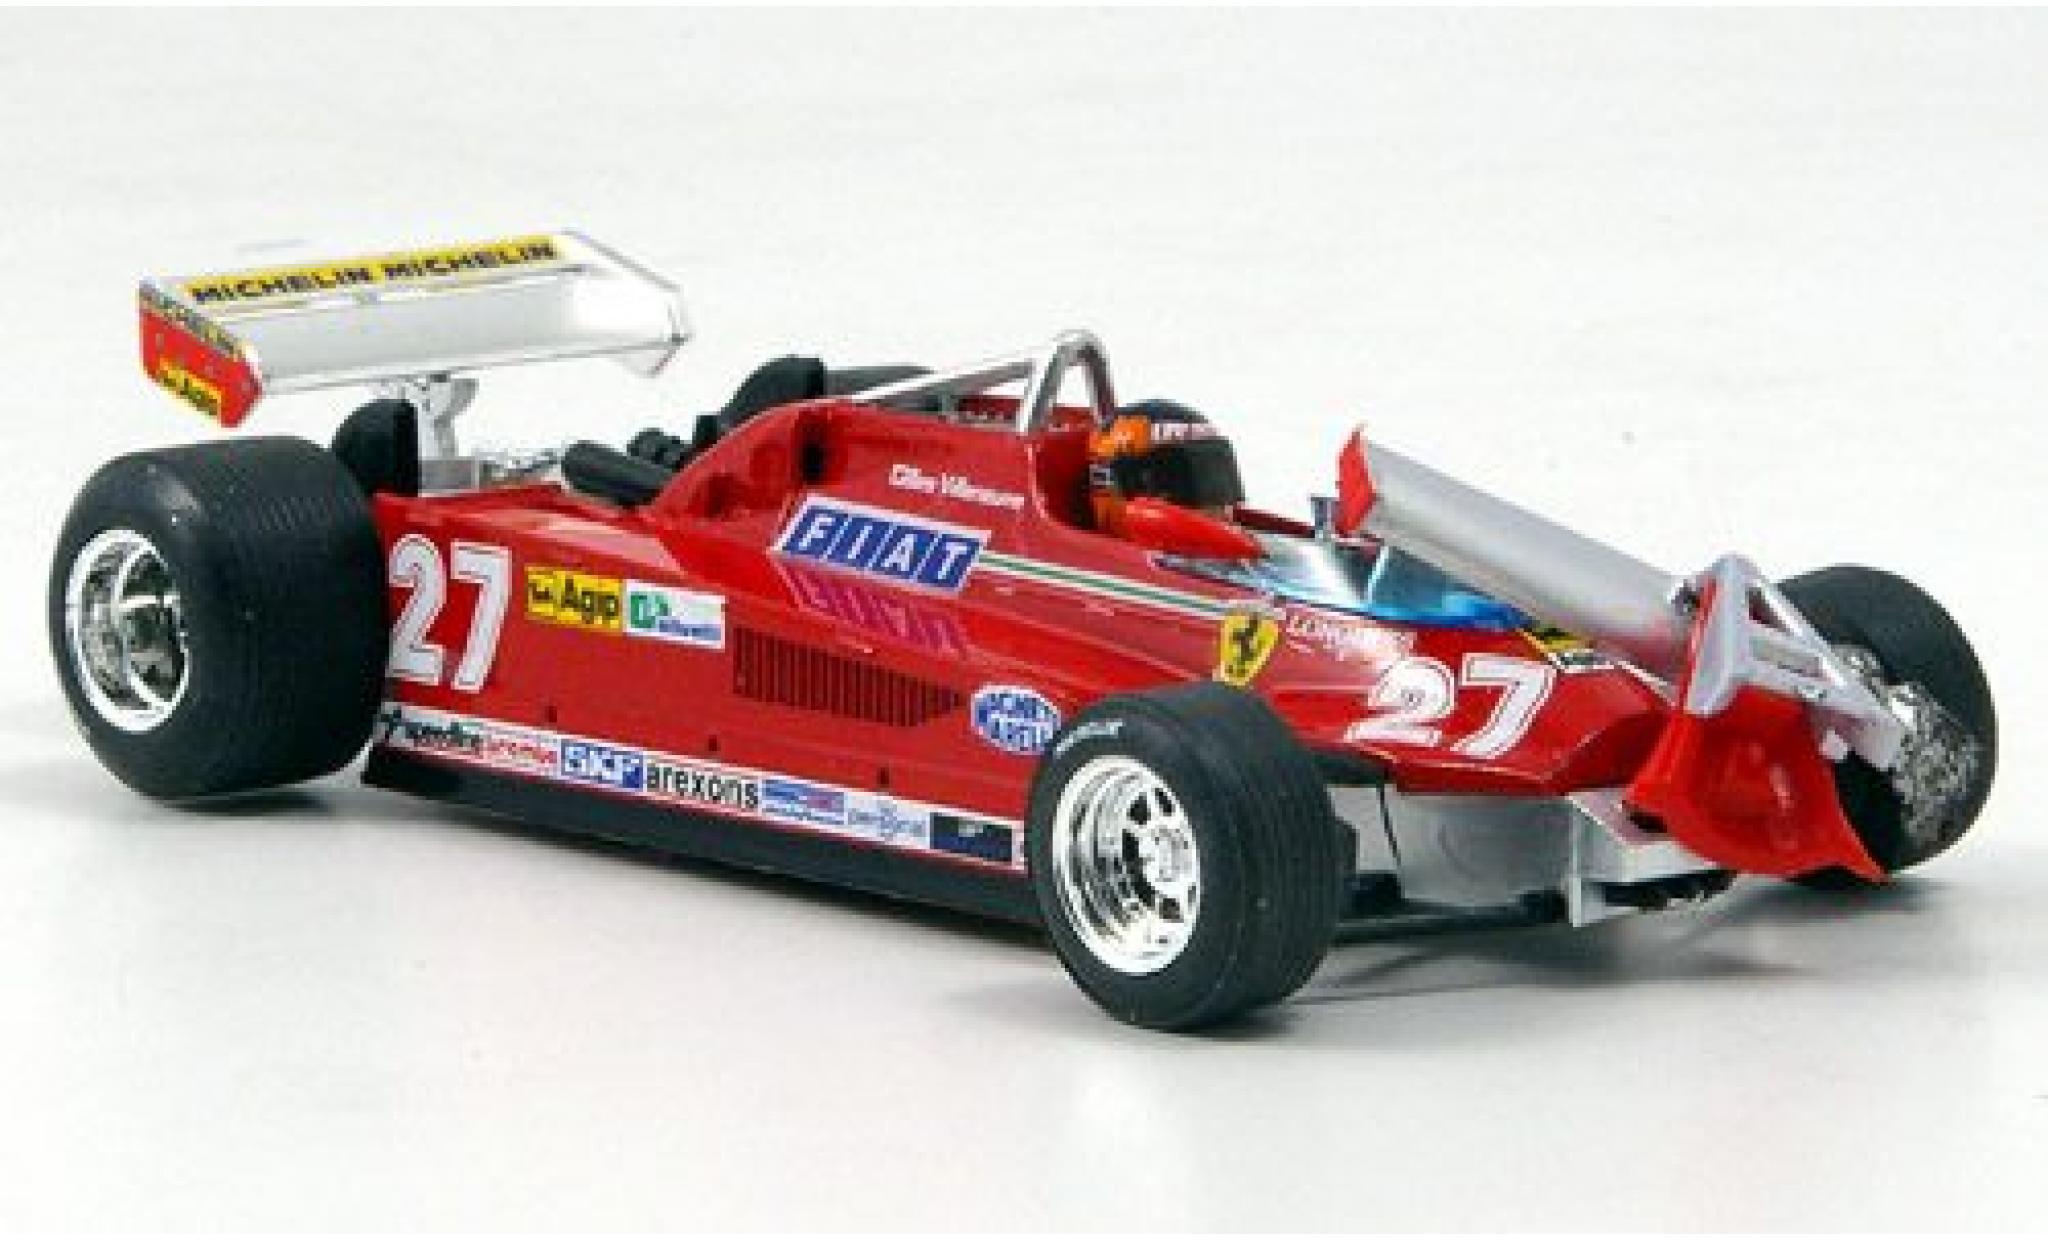 Ferrari 126 1/43 Brumm CK Turbo No.27 Scuderia Formel 1 GP Kanada 1981 ronde 55-56 G.Villeneuve